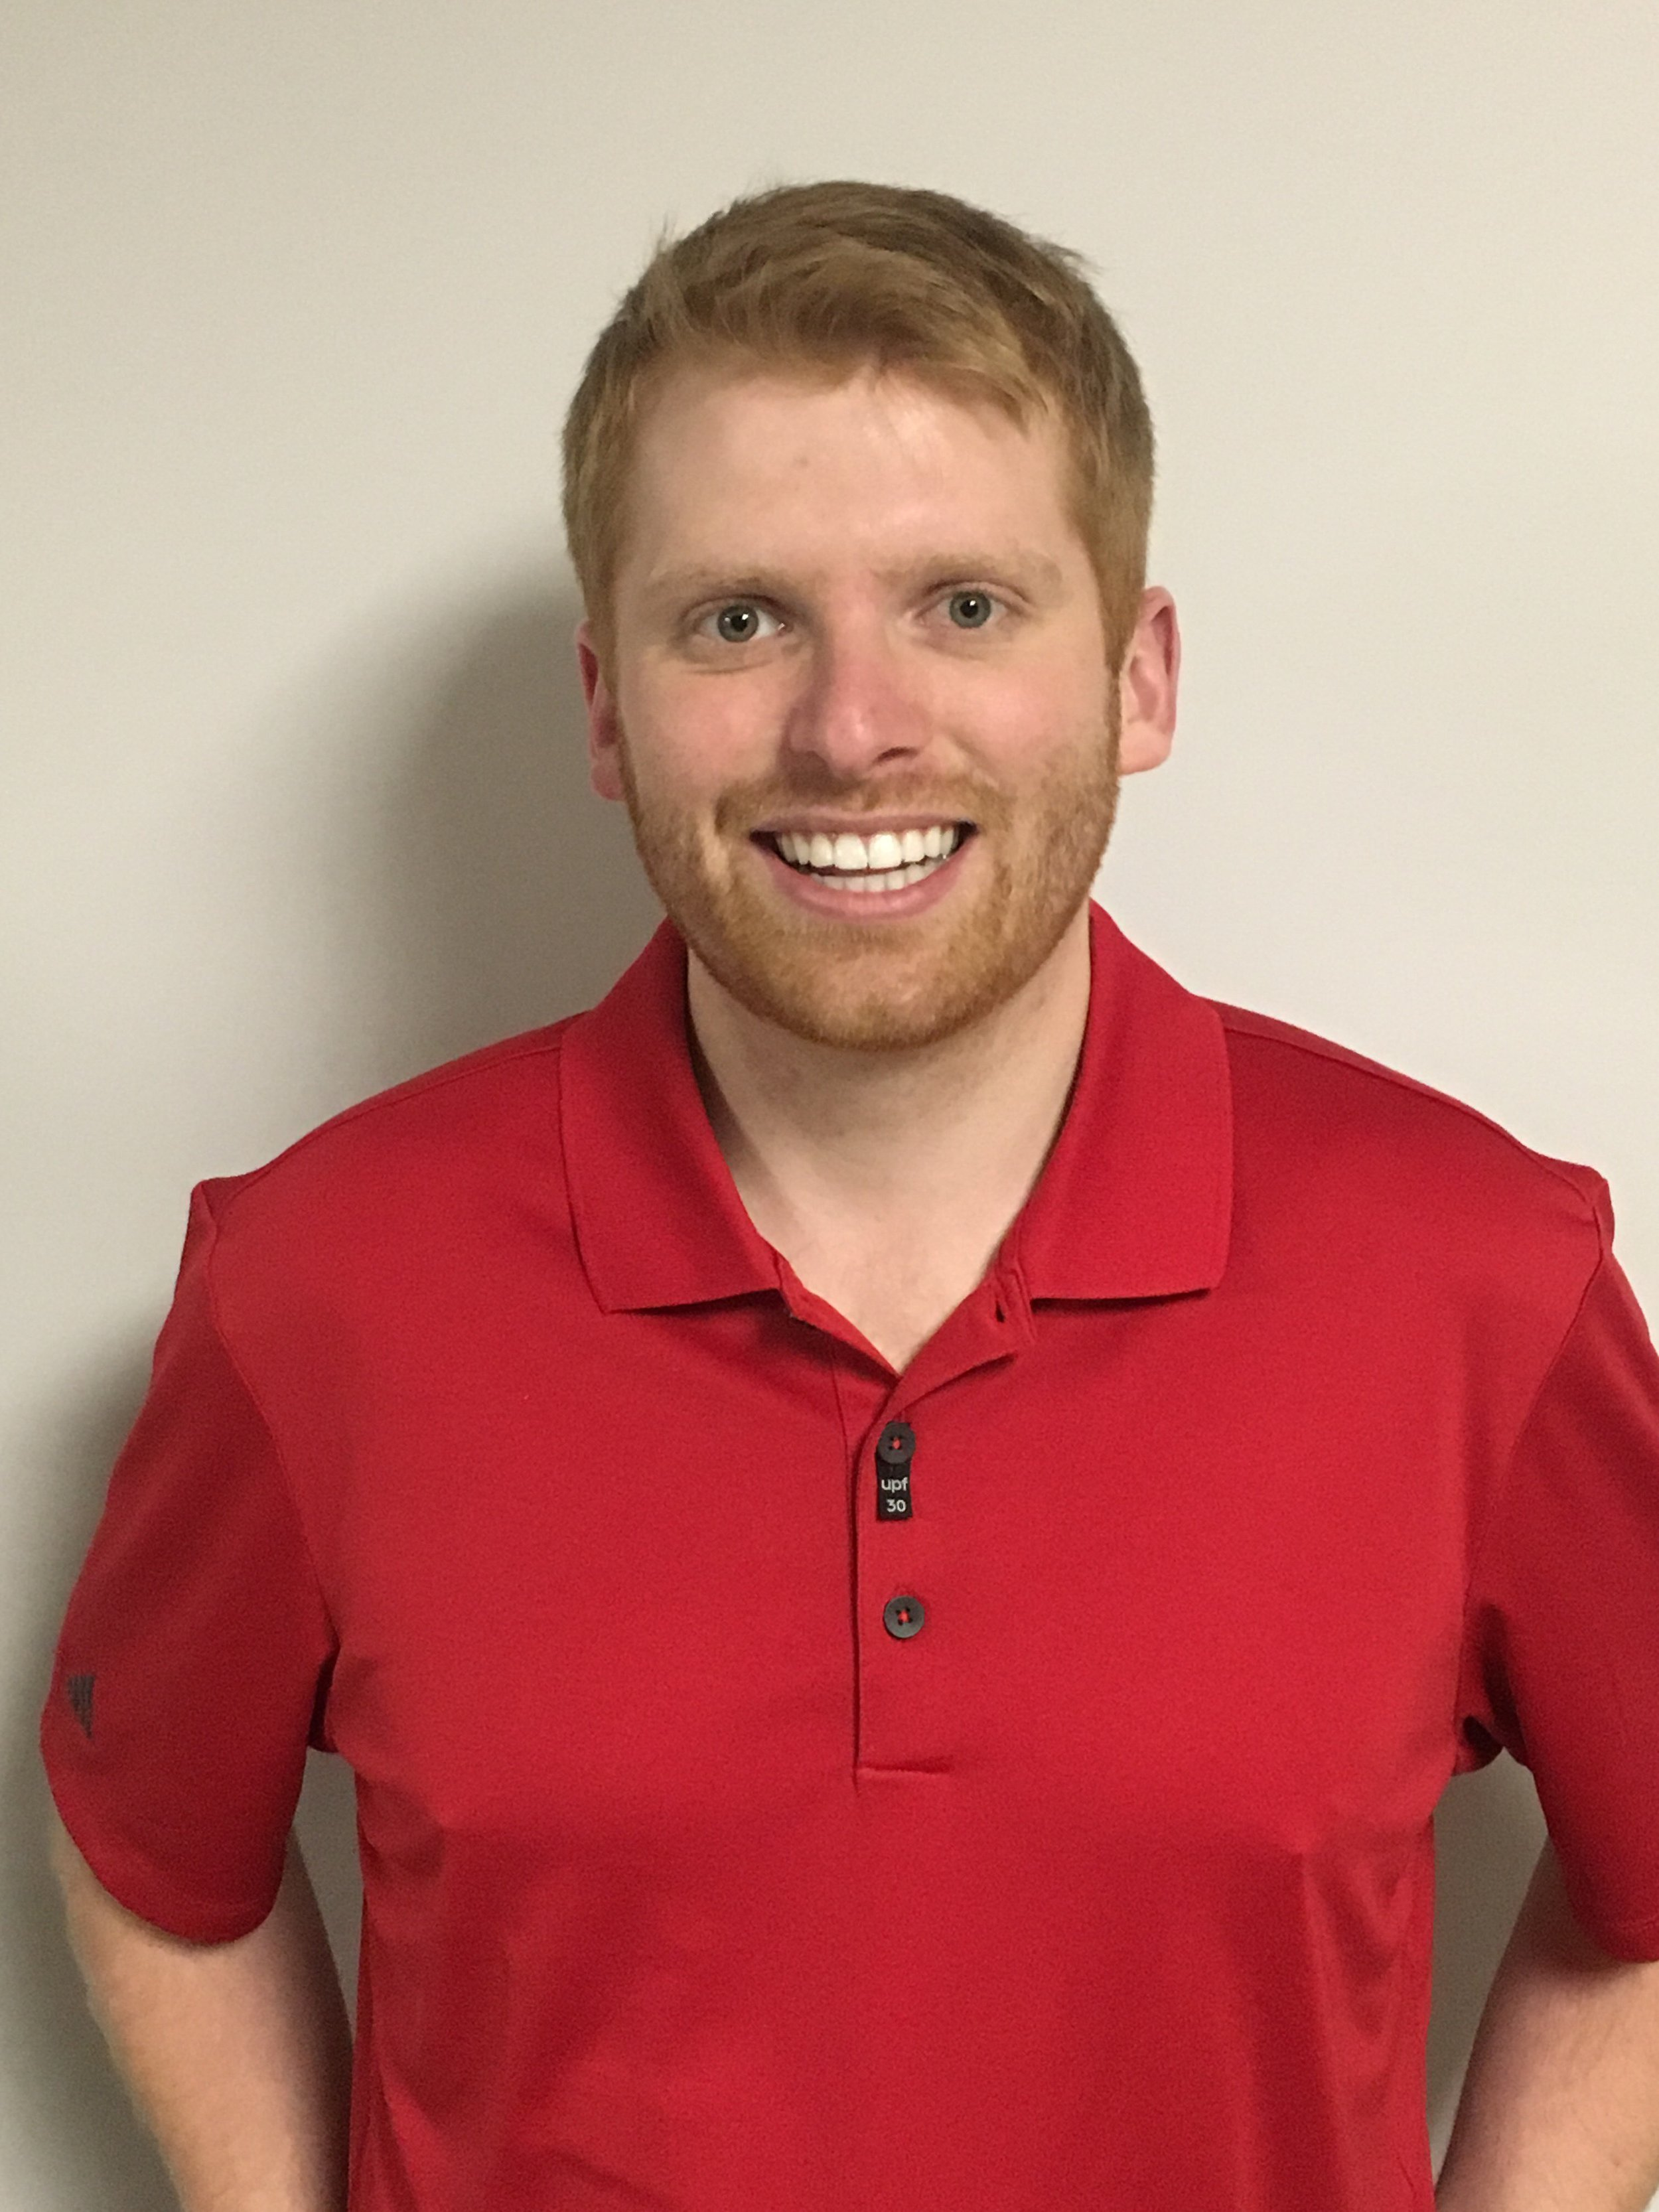 Ben Zavitz, CFP, CLU Paddyfest Char & Website, 3rd year Kinsmen Financial Advisor at Van Gerwen Financial Services Ltd.